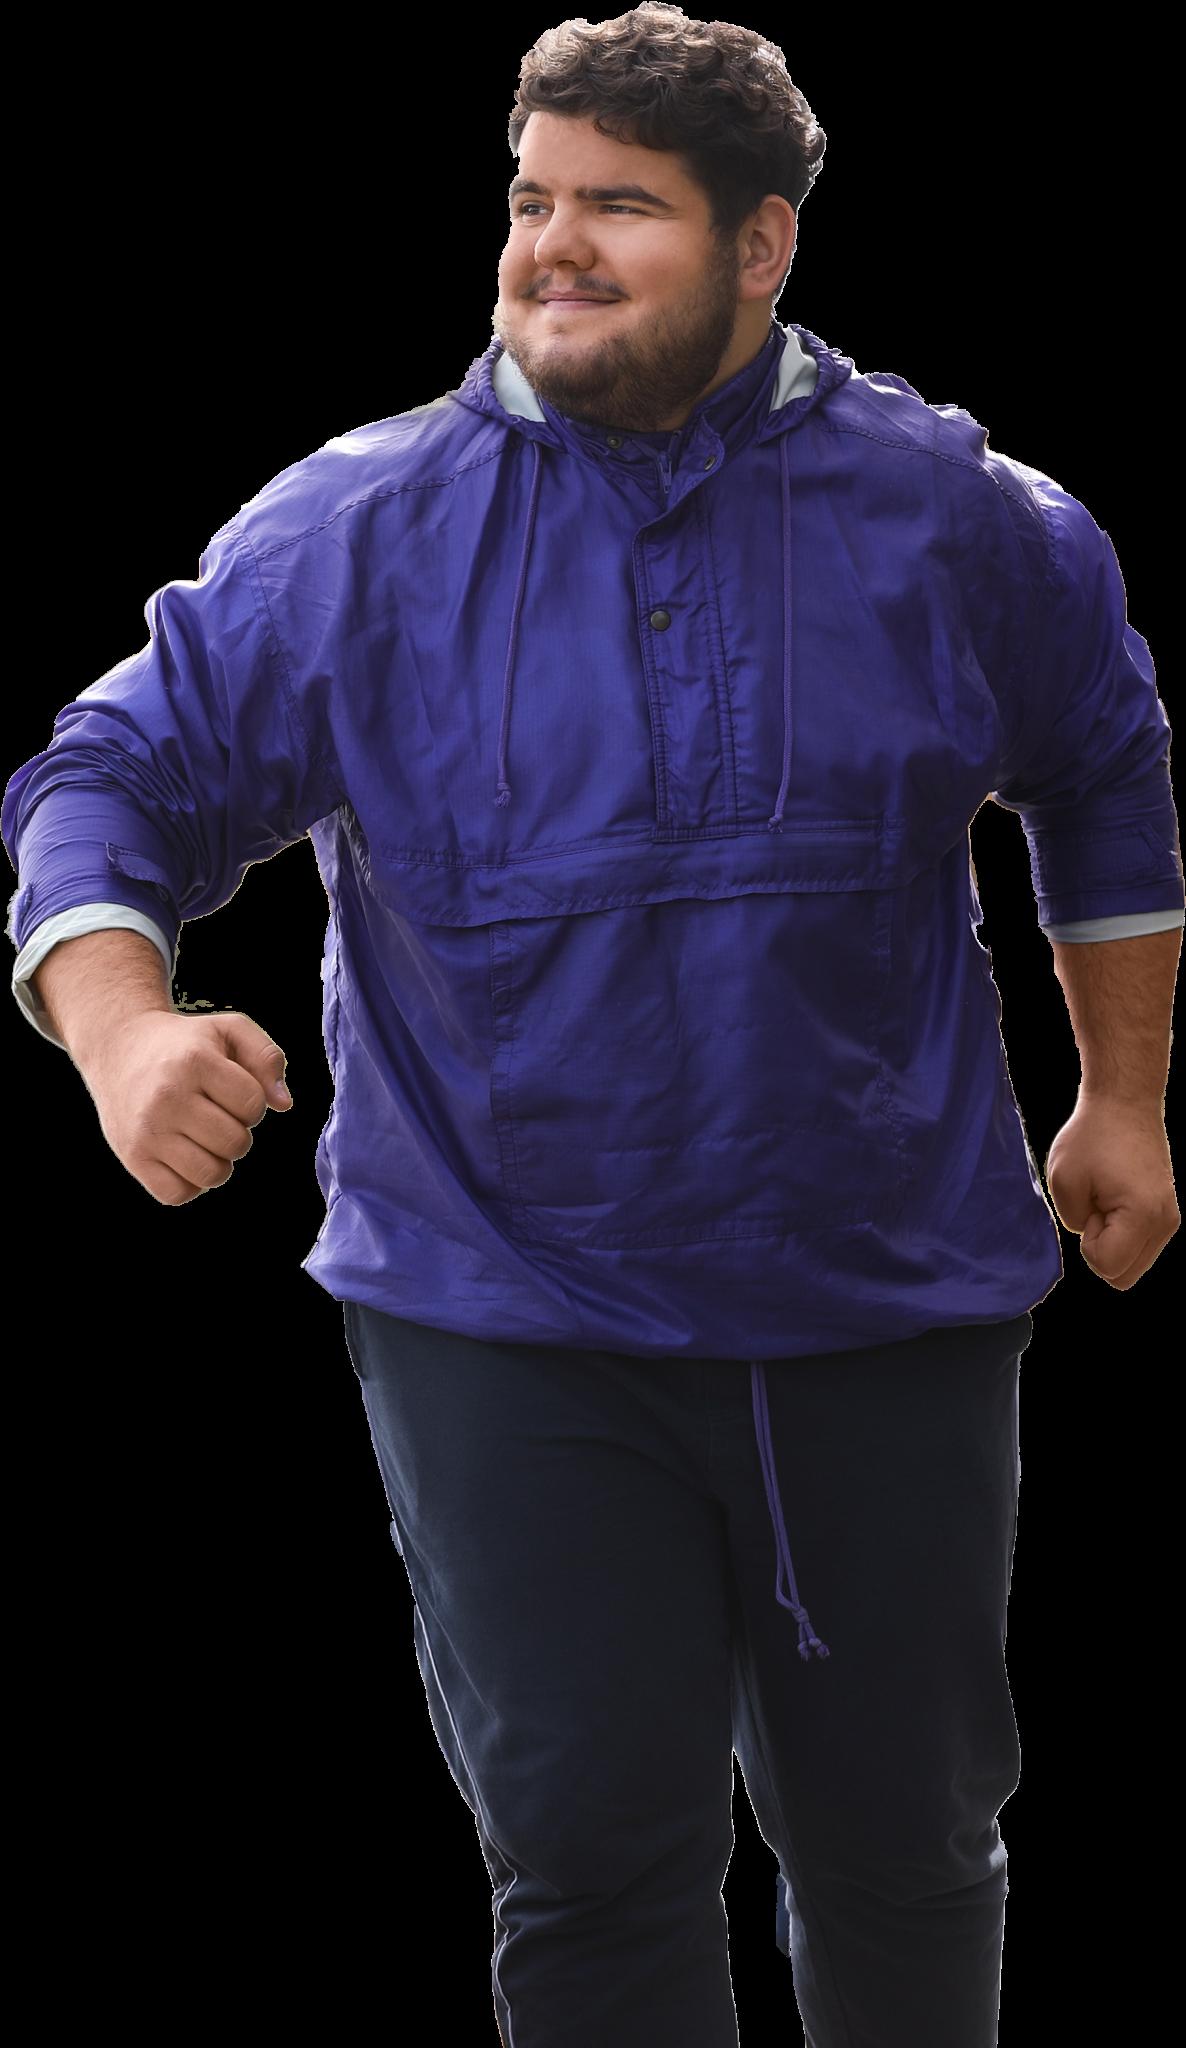 man exercising in purple coat and black jogging bottoms